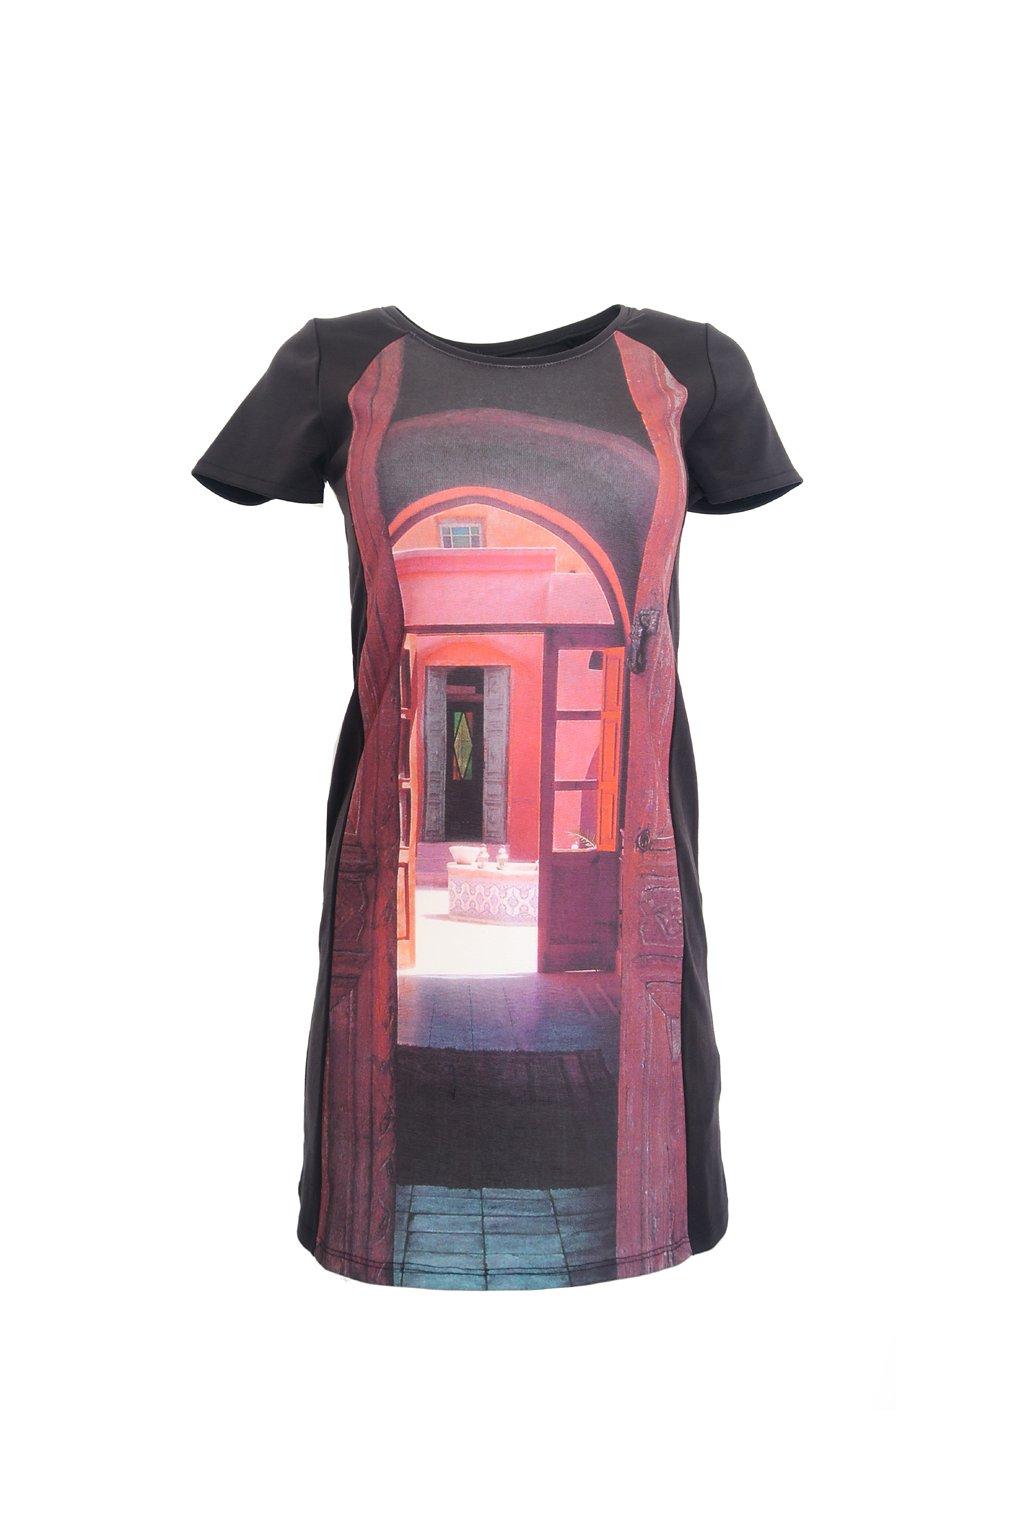 Desigual šaty s domečkem